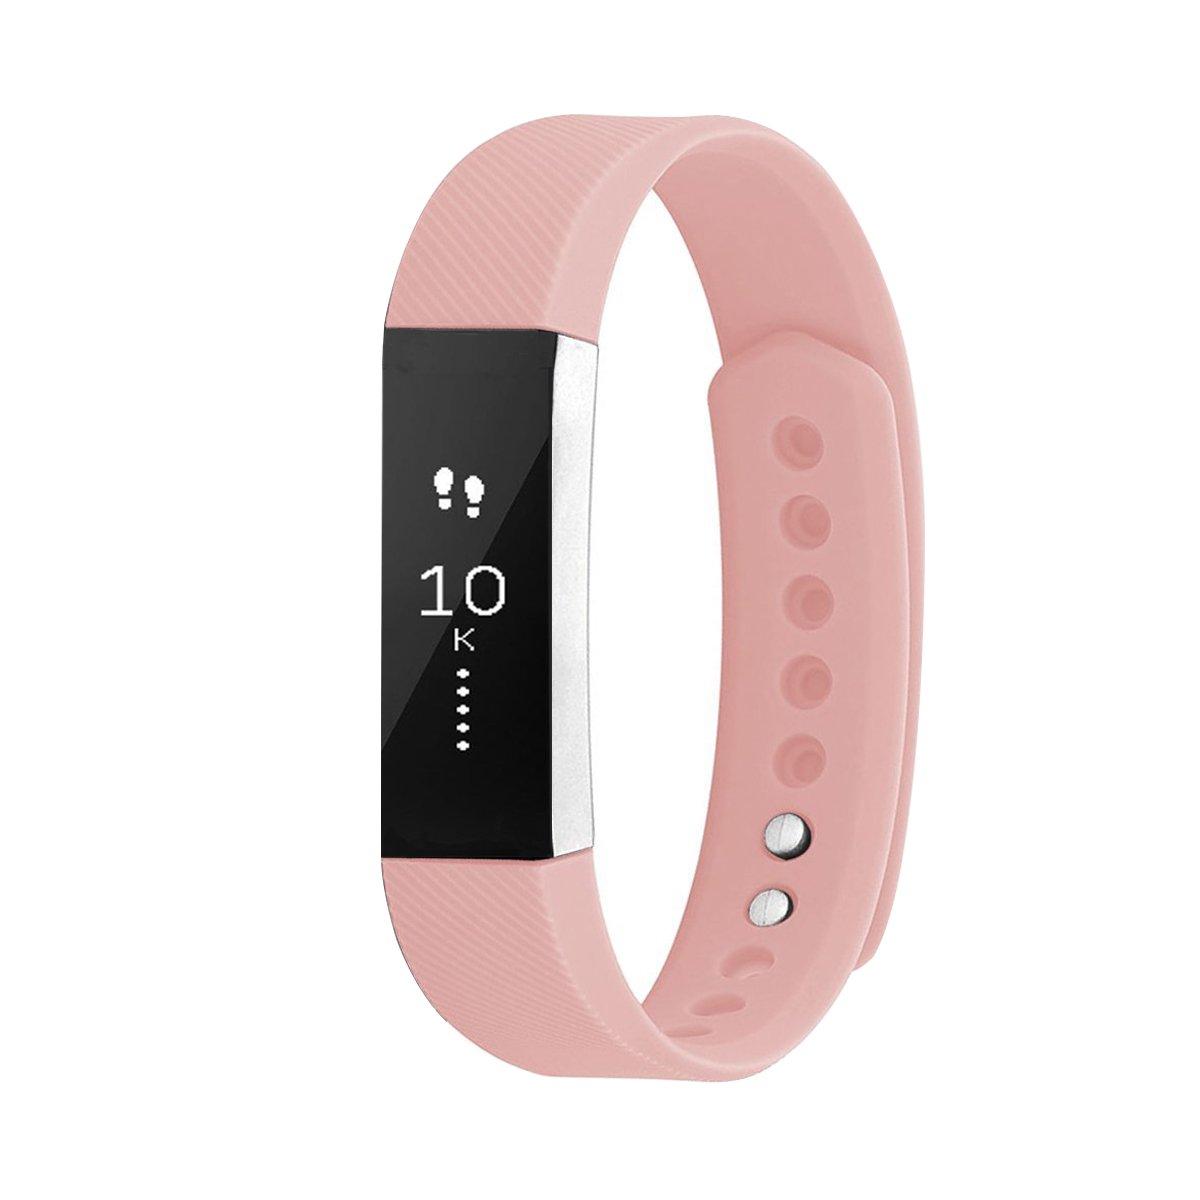 Fitbit ALTA HRバンド/AltaバンドWZE快適通気性ソフトシリコンカラースポーツアクセサリー用交換リストバンドfitbitalta複数の穴とFitbit ALTA HR 2 B071XQB63S ピンク Large Size